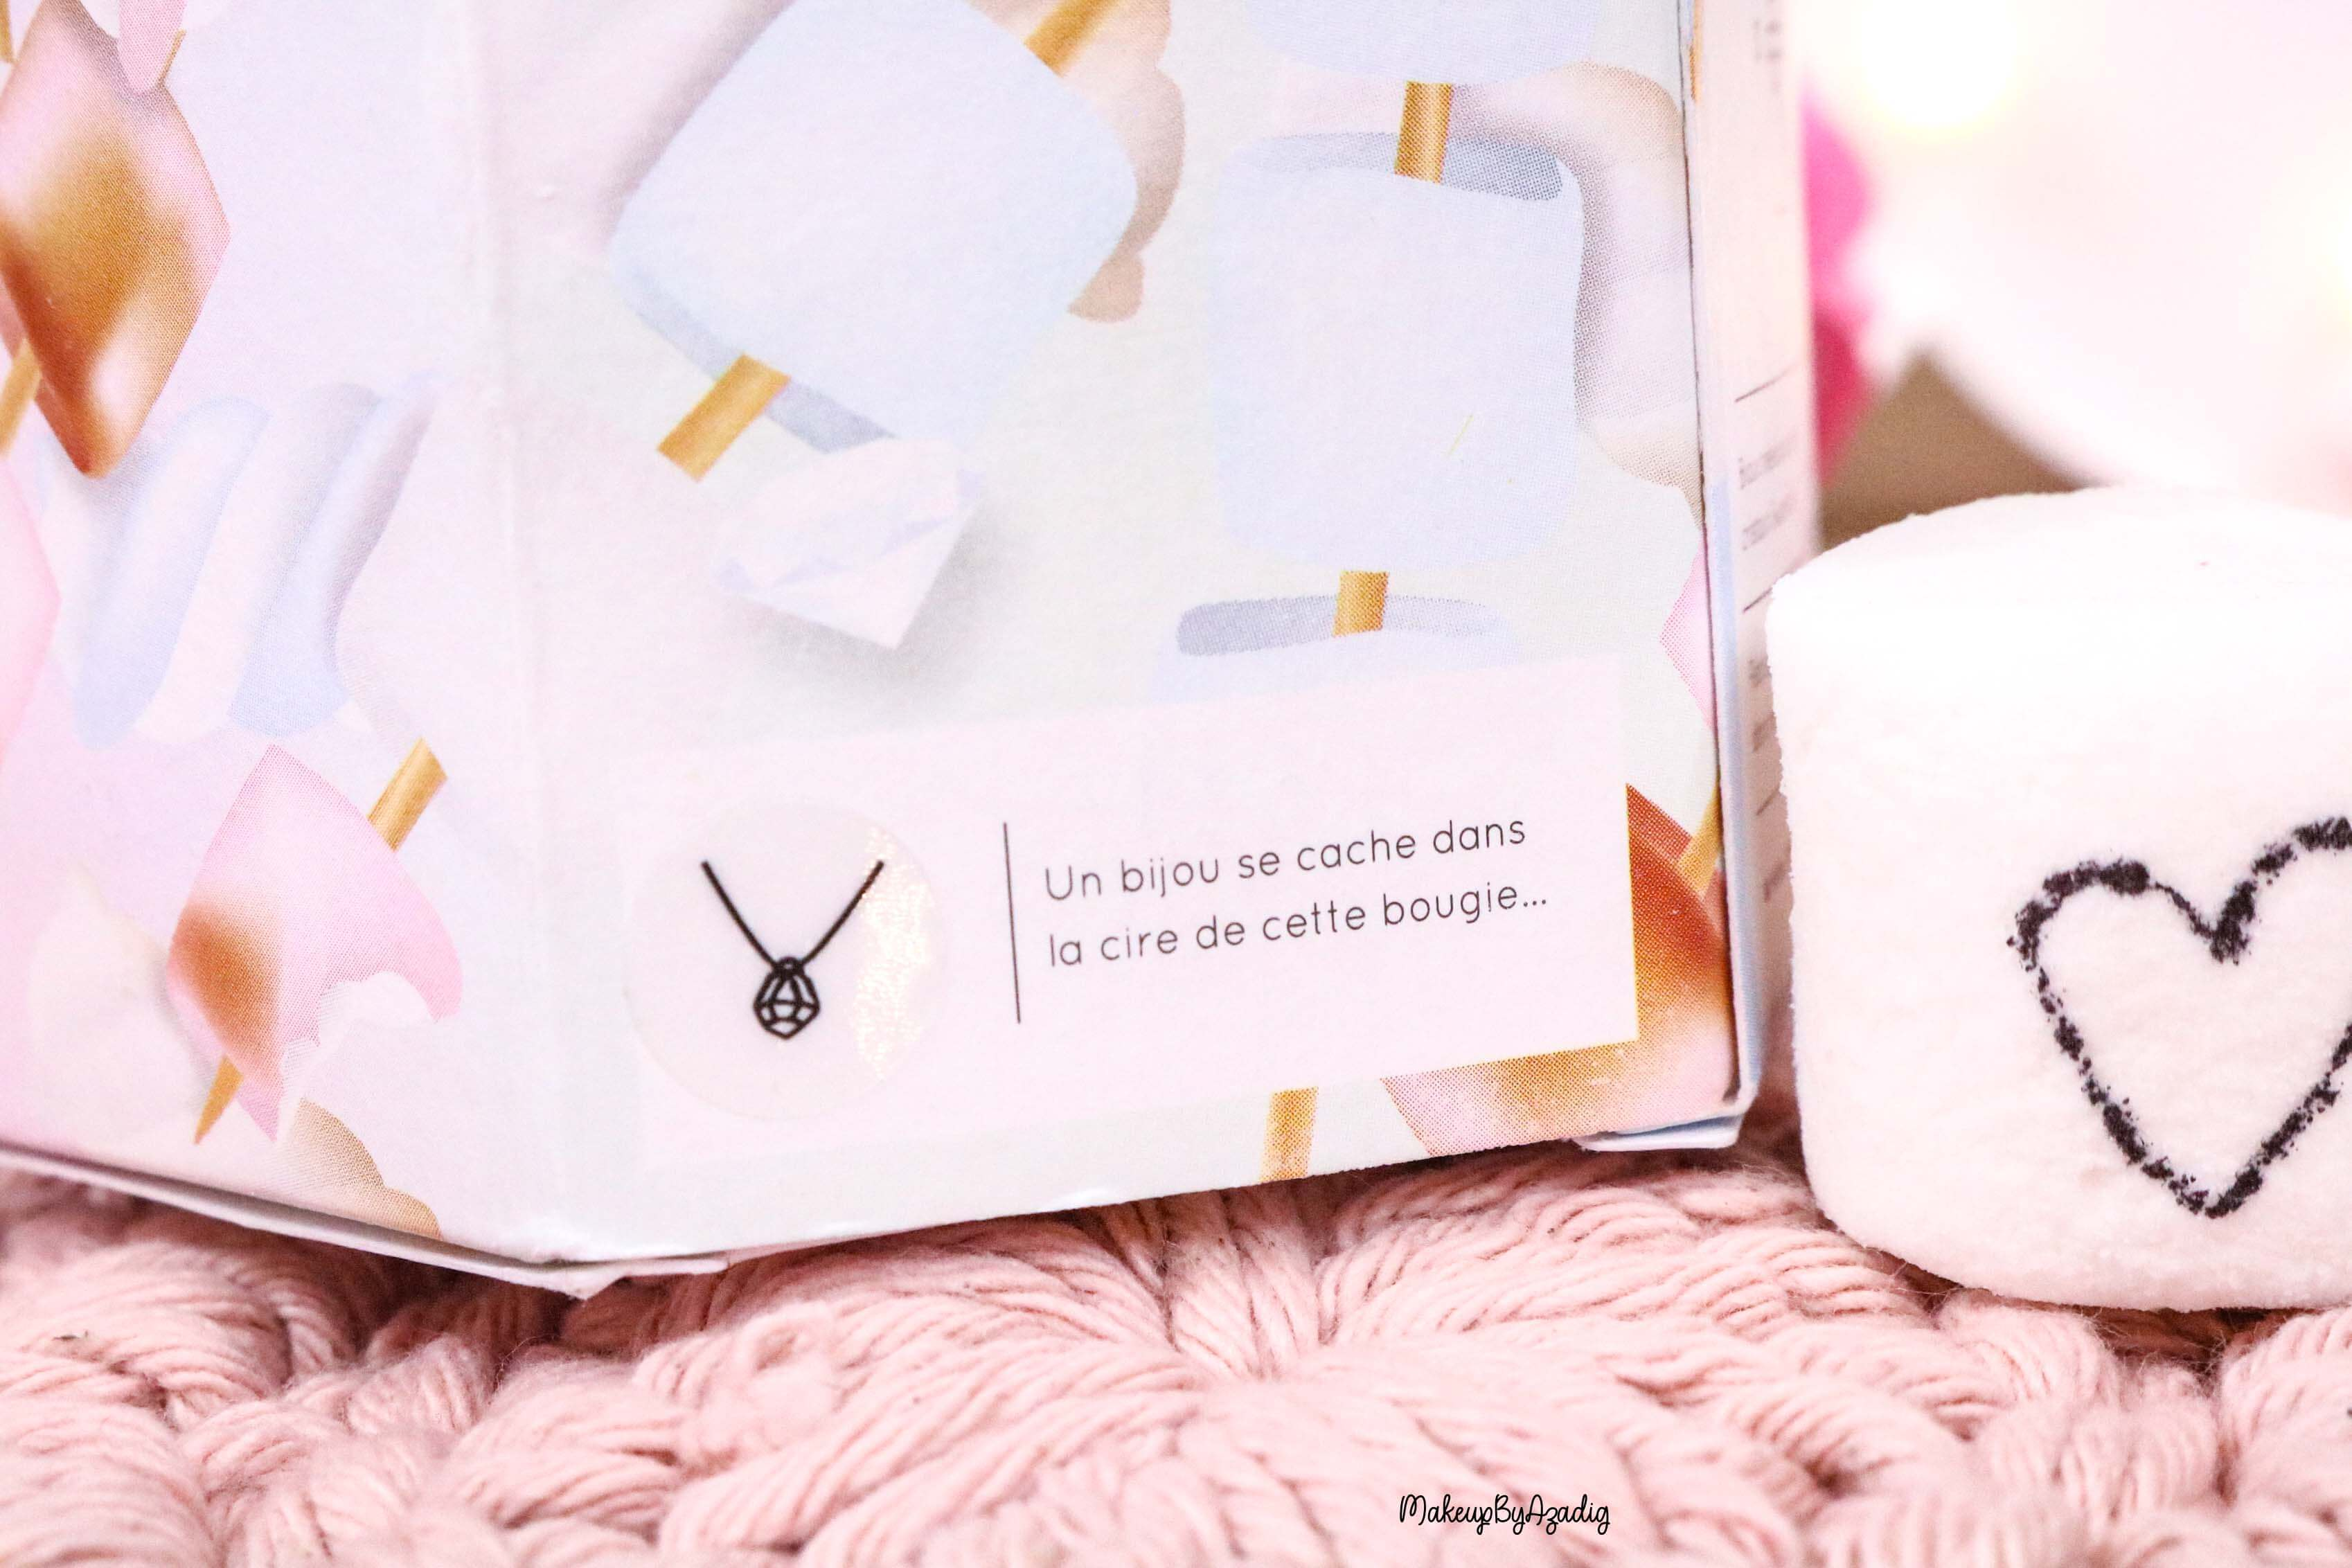 my-jolie-candle-bougie-bijou-swarovski-argent-cadeau-maman-mamie-femme-makeupbyazadig-collector-chamallow-avis-prix-collier